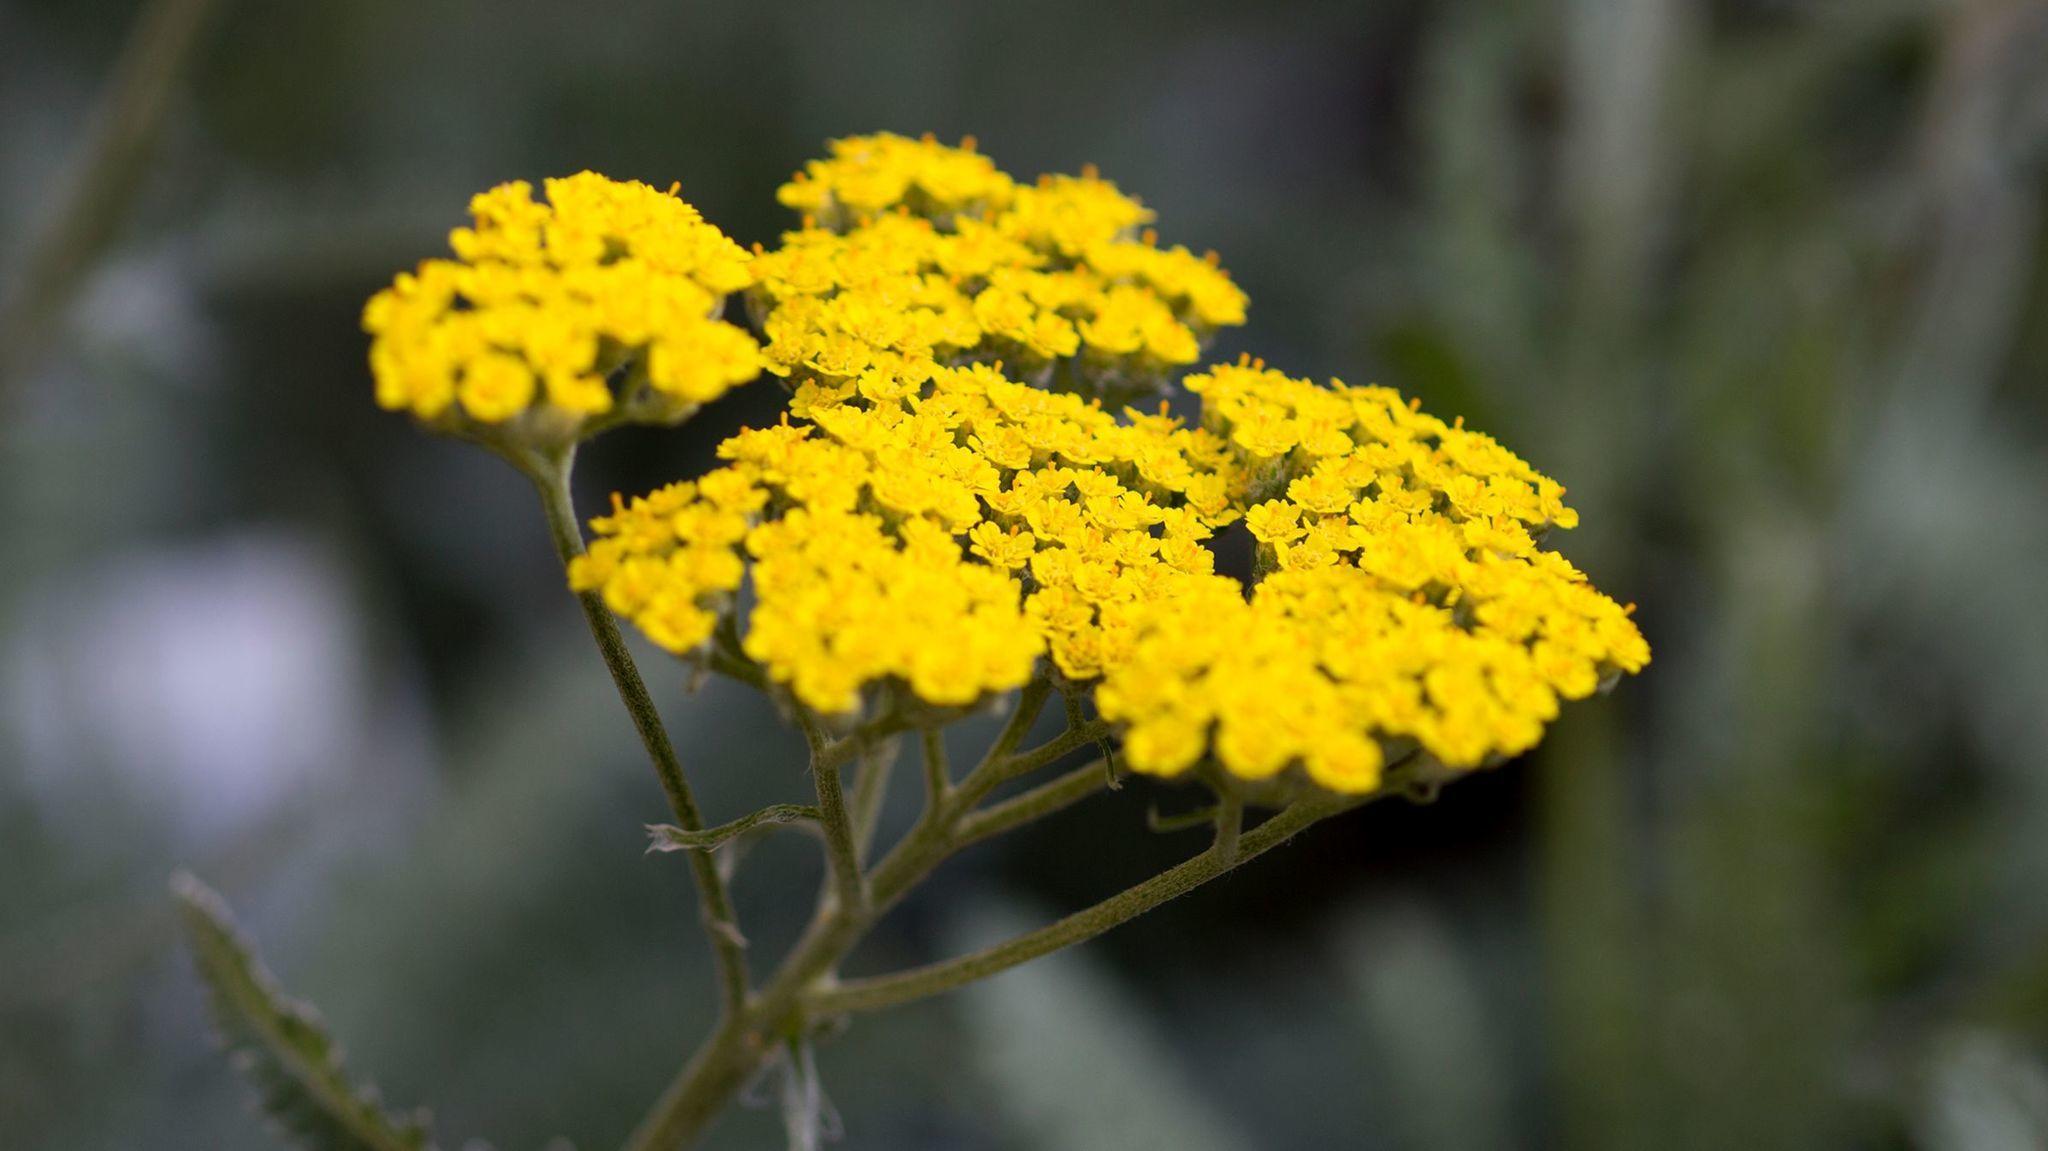 Among the drought-tolerant plants: yarrow